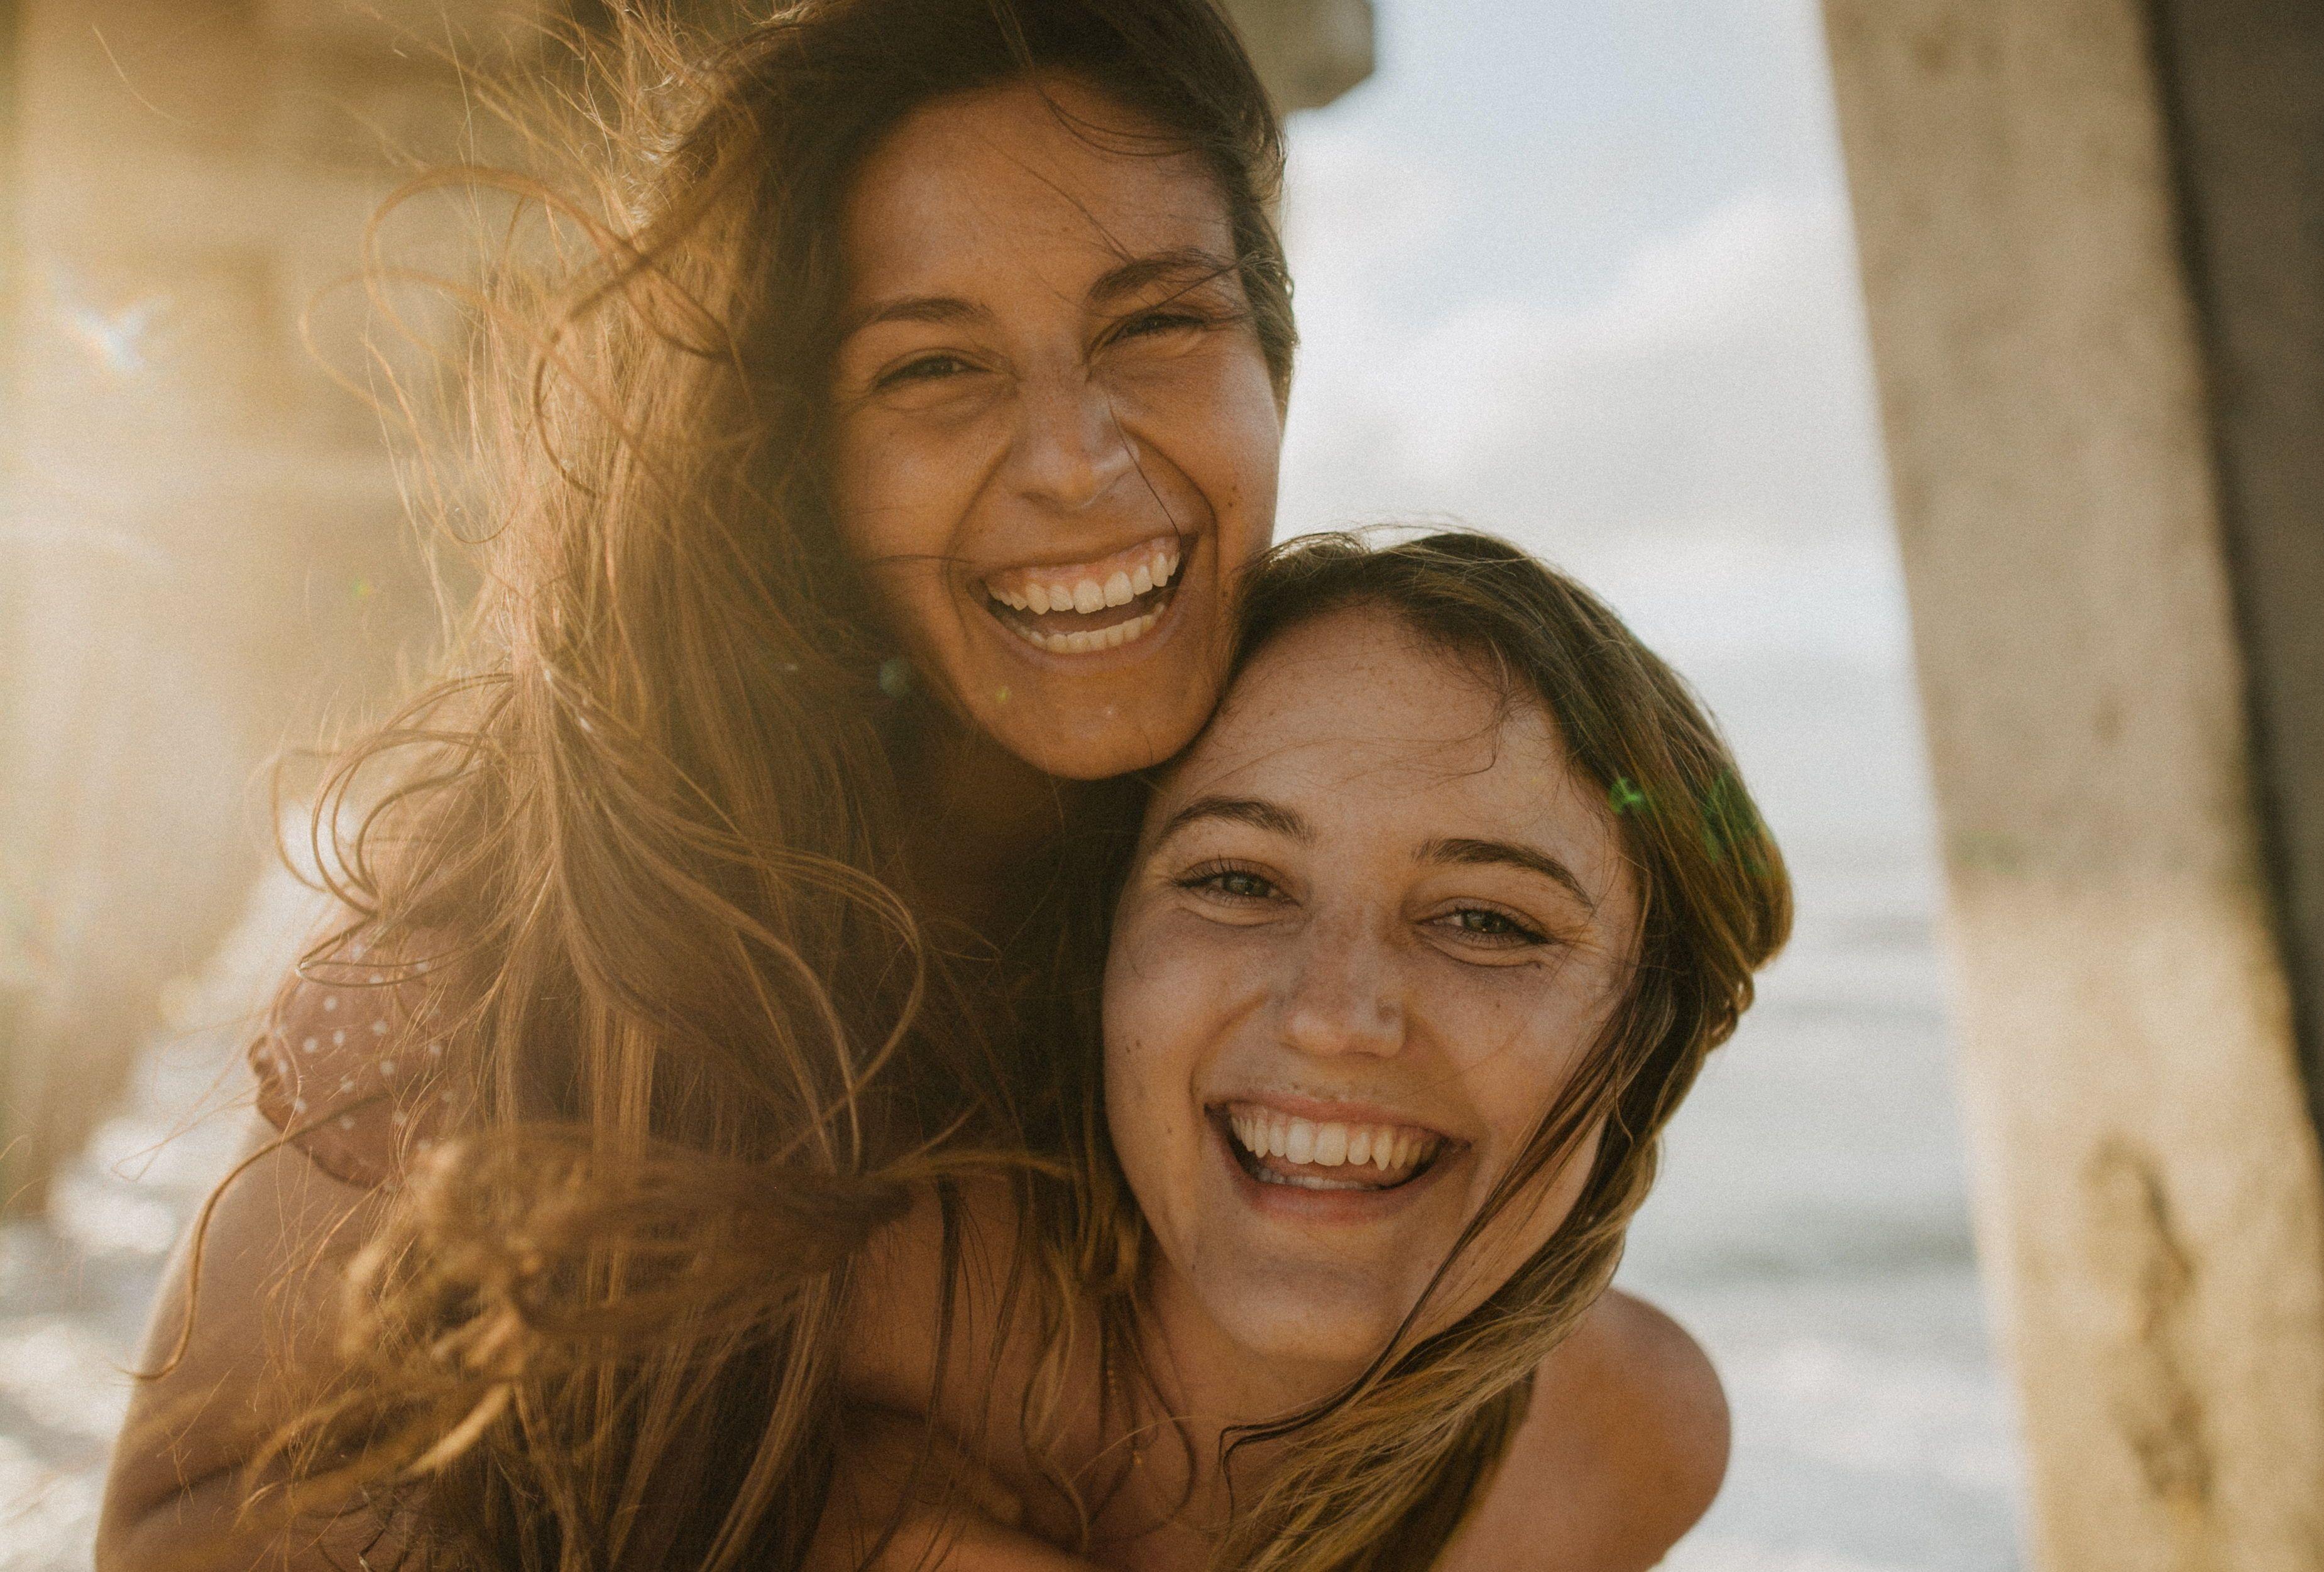 Venice, Florida Best friends give the best piggyback rides